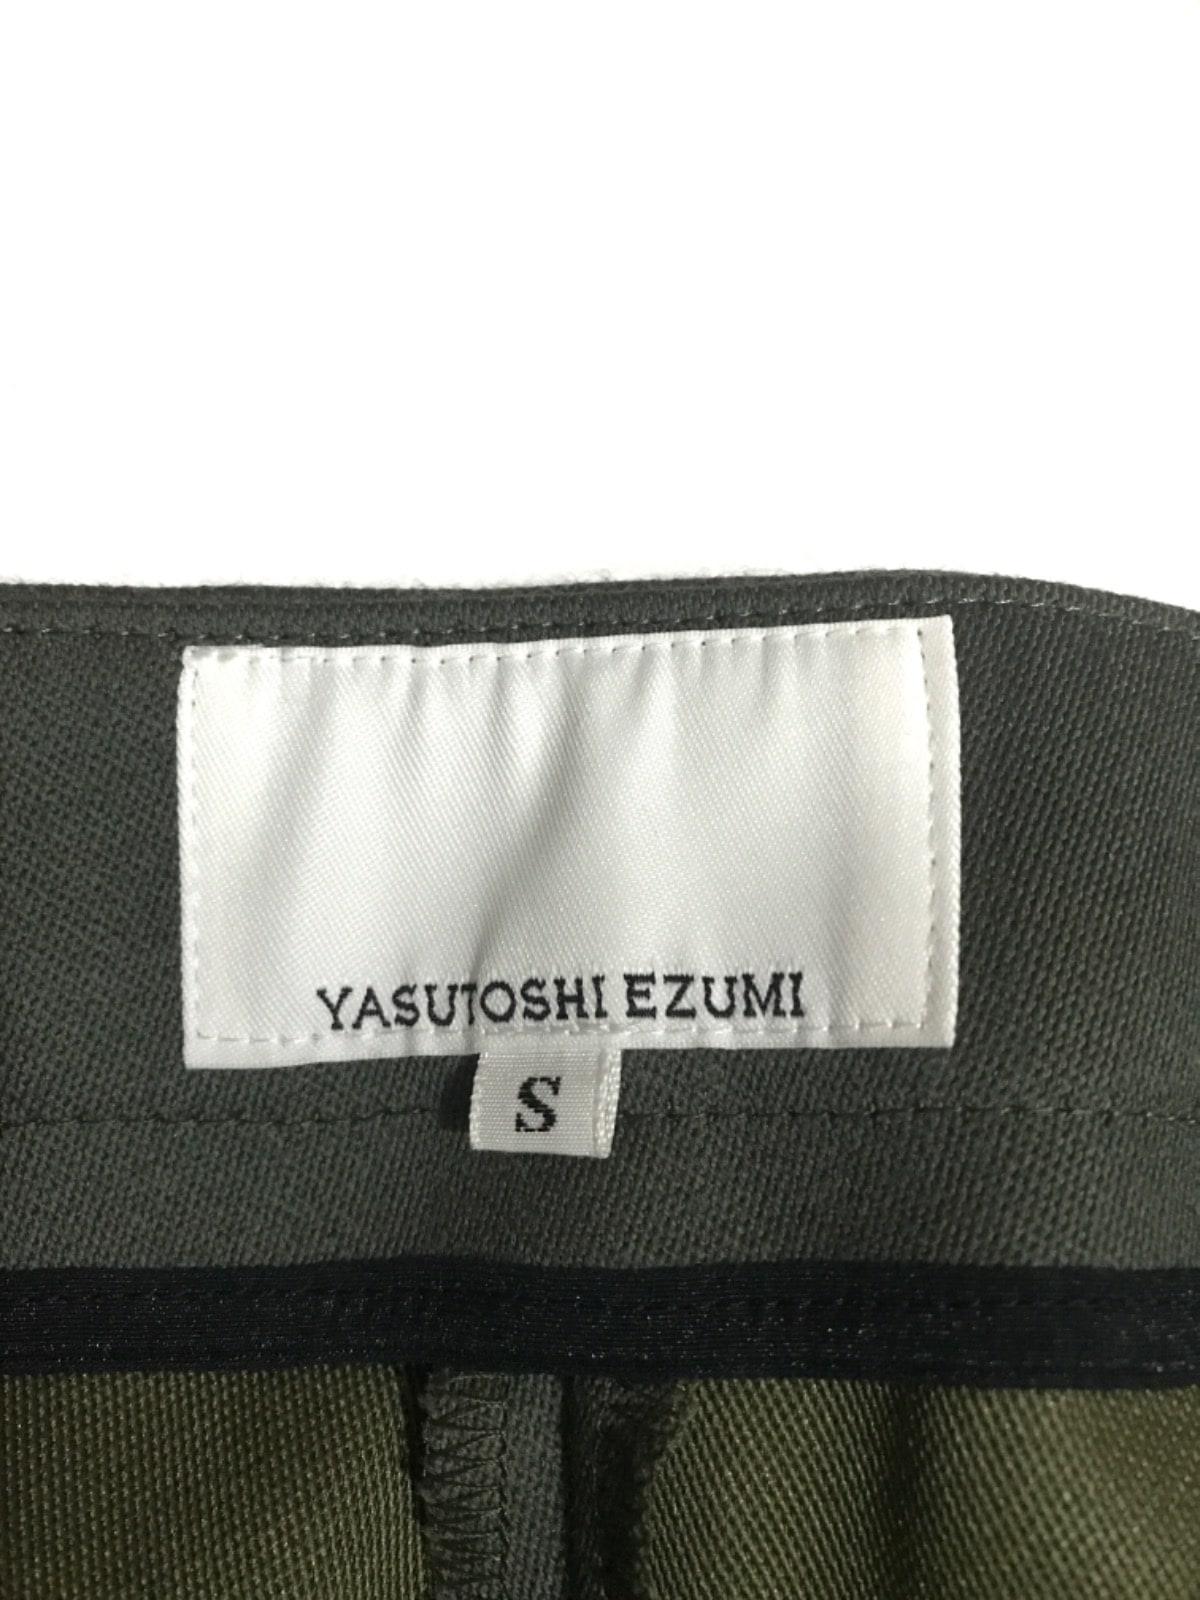 Yasutoshi Ezumi(ヤストシ エズミ)のパンツ